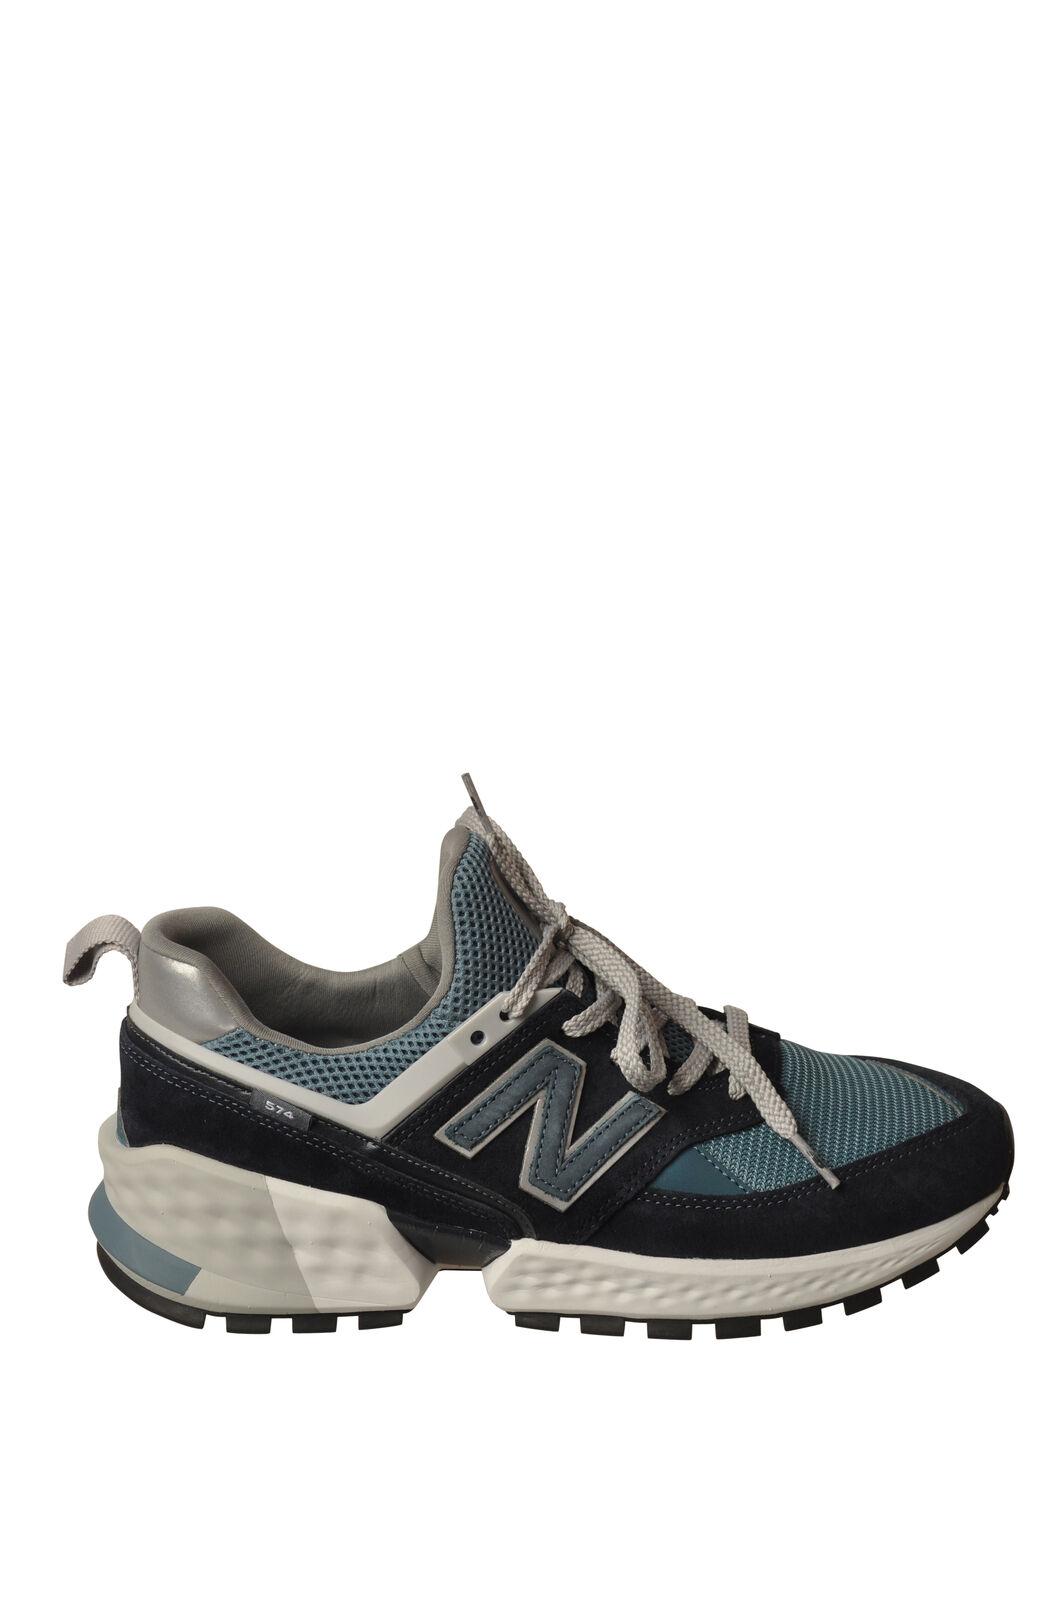 New Balance - zapatos-Lace Up - Man - azul - 6219329E191235